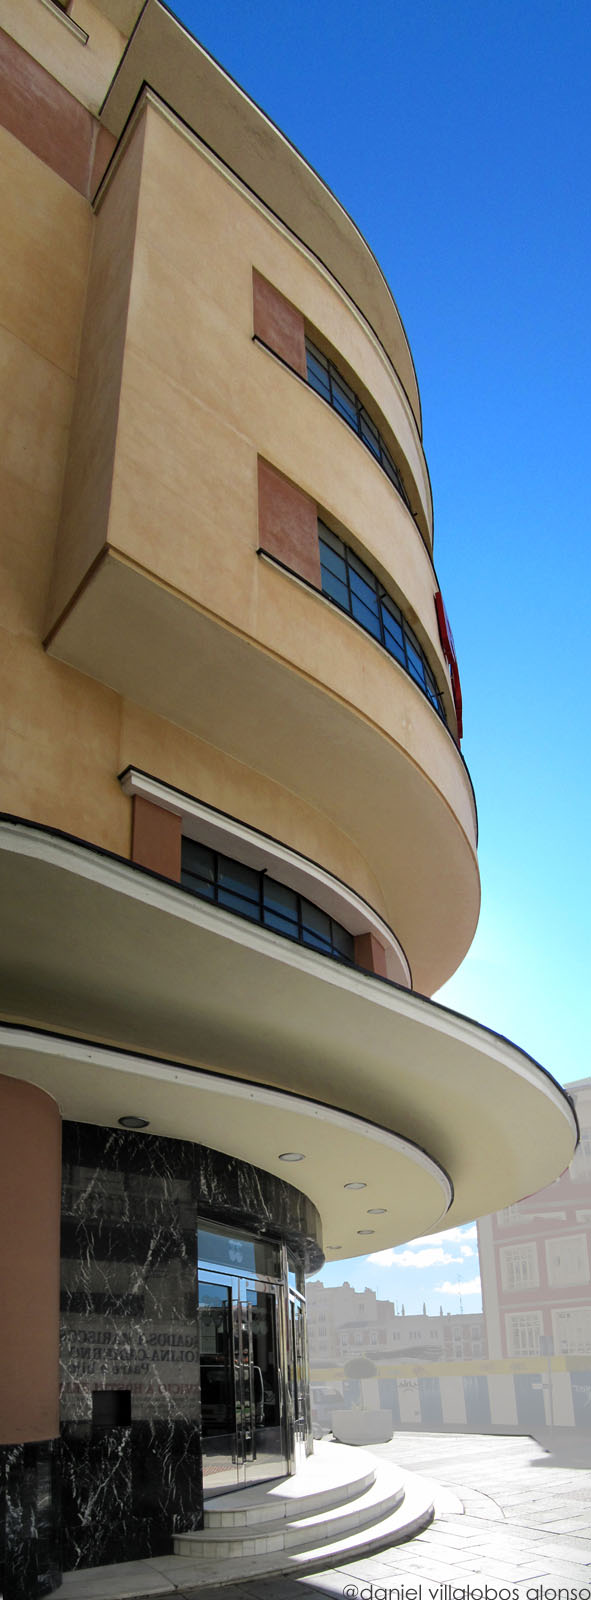 danielvillalobos-cines-digitalphotographies-modernarchitecture-15